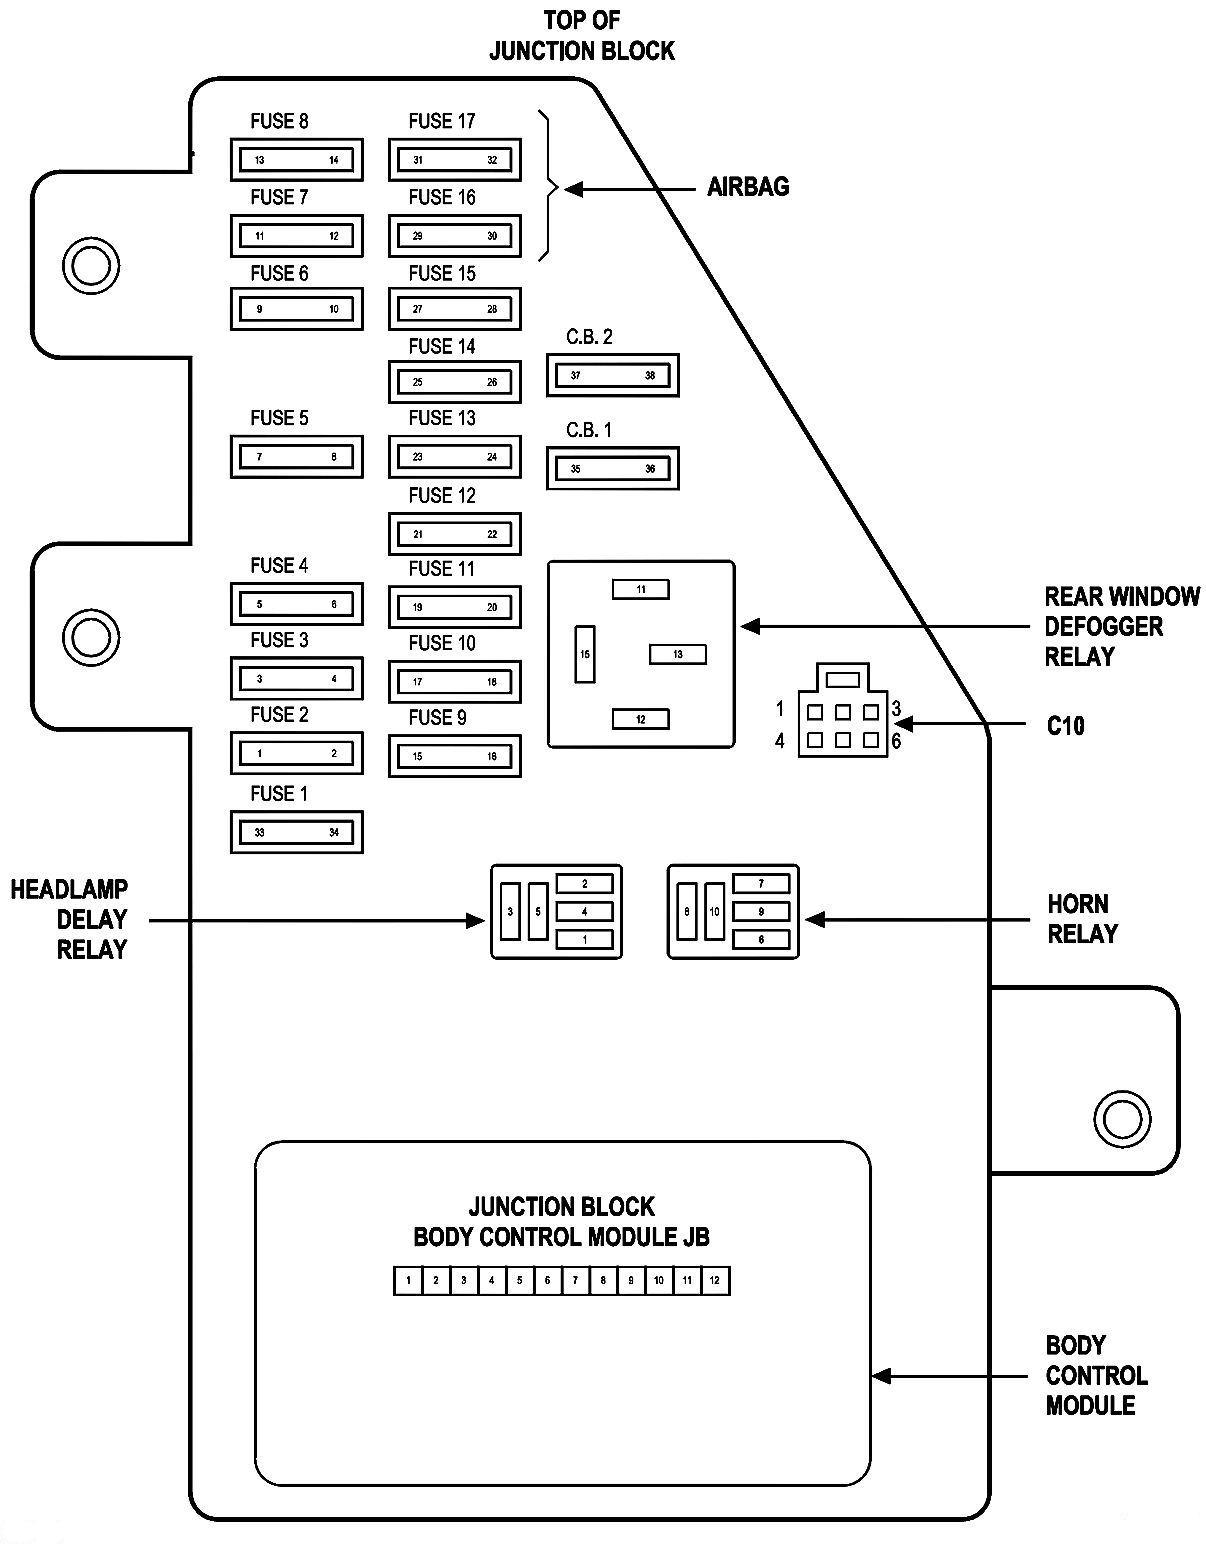 2005 Sebring Fuse Box Diagram - Mercedes Benz Sprinter Van Wiring Harness -  rccar-wiring.2010menanti.jeanjaures37.frWiring Diagram